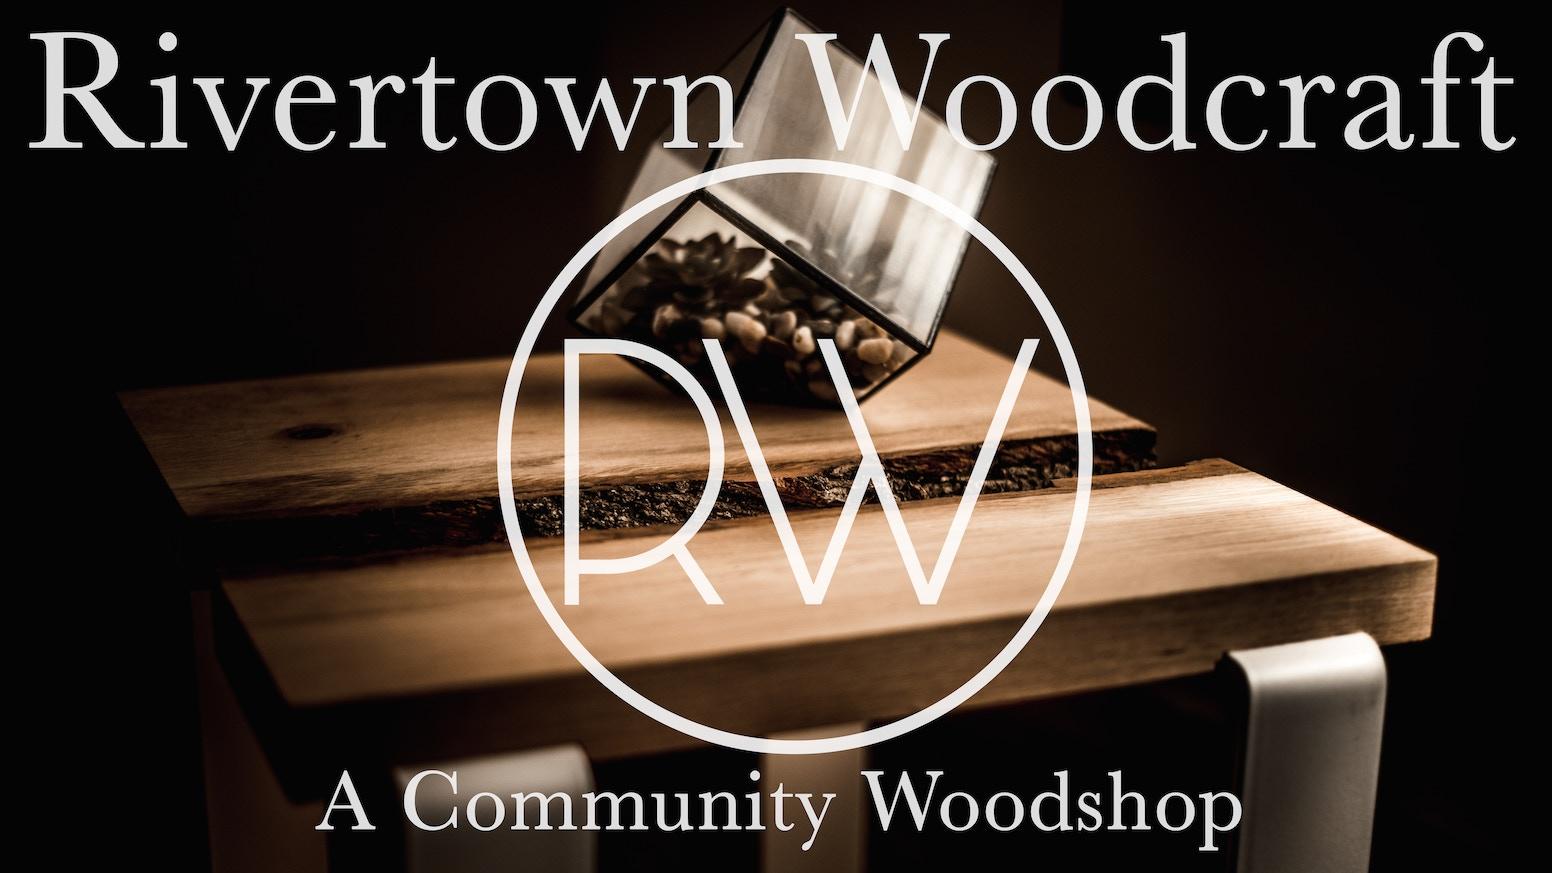 Rivertown Woodcraft A Community Woodshop By Jim Torrey